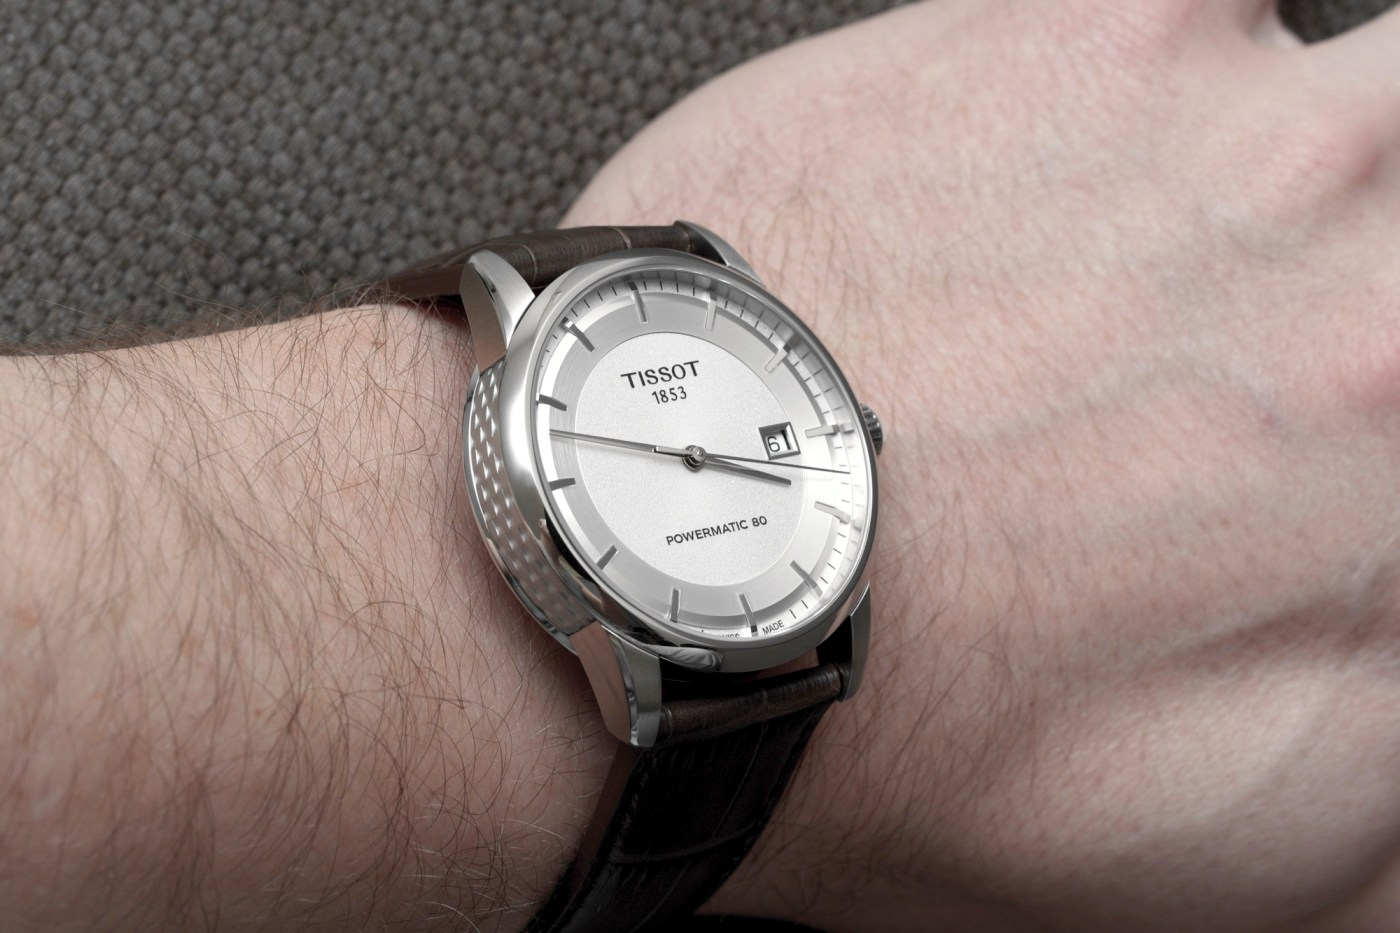 Tissot Powermatic 80 wristshot